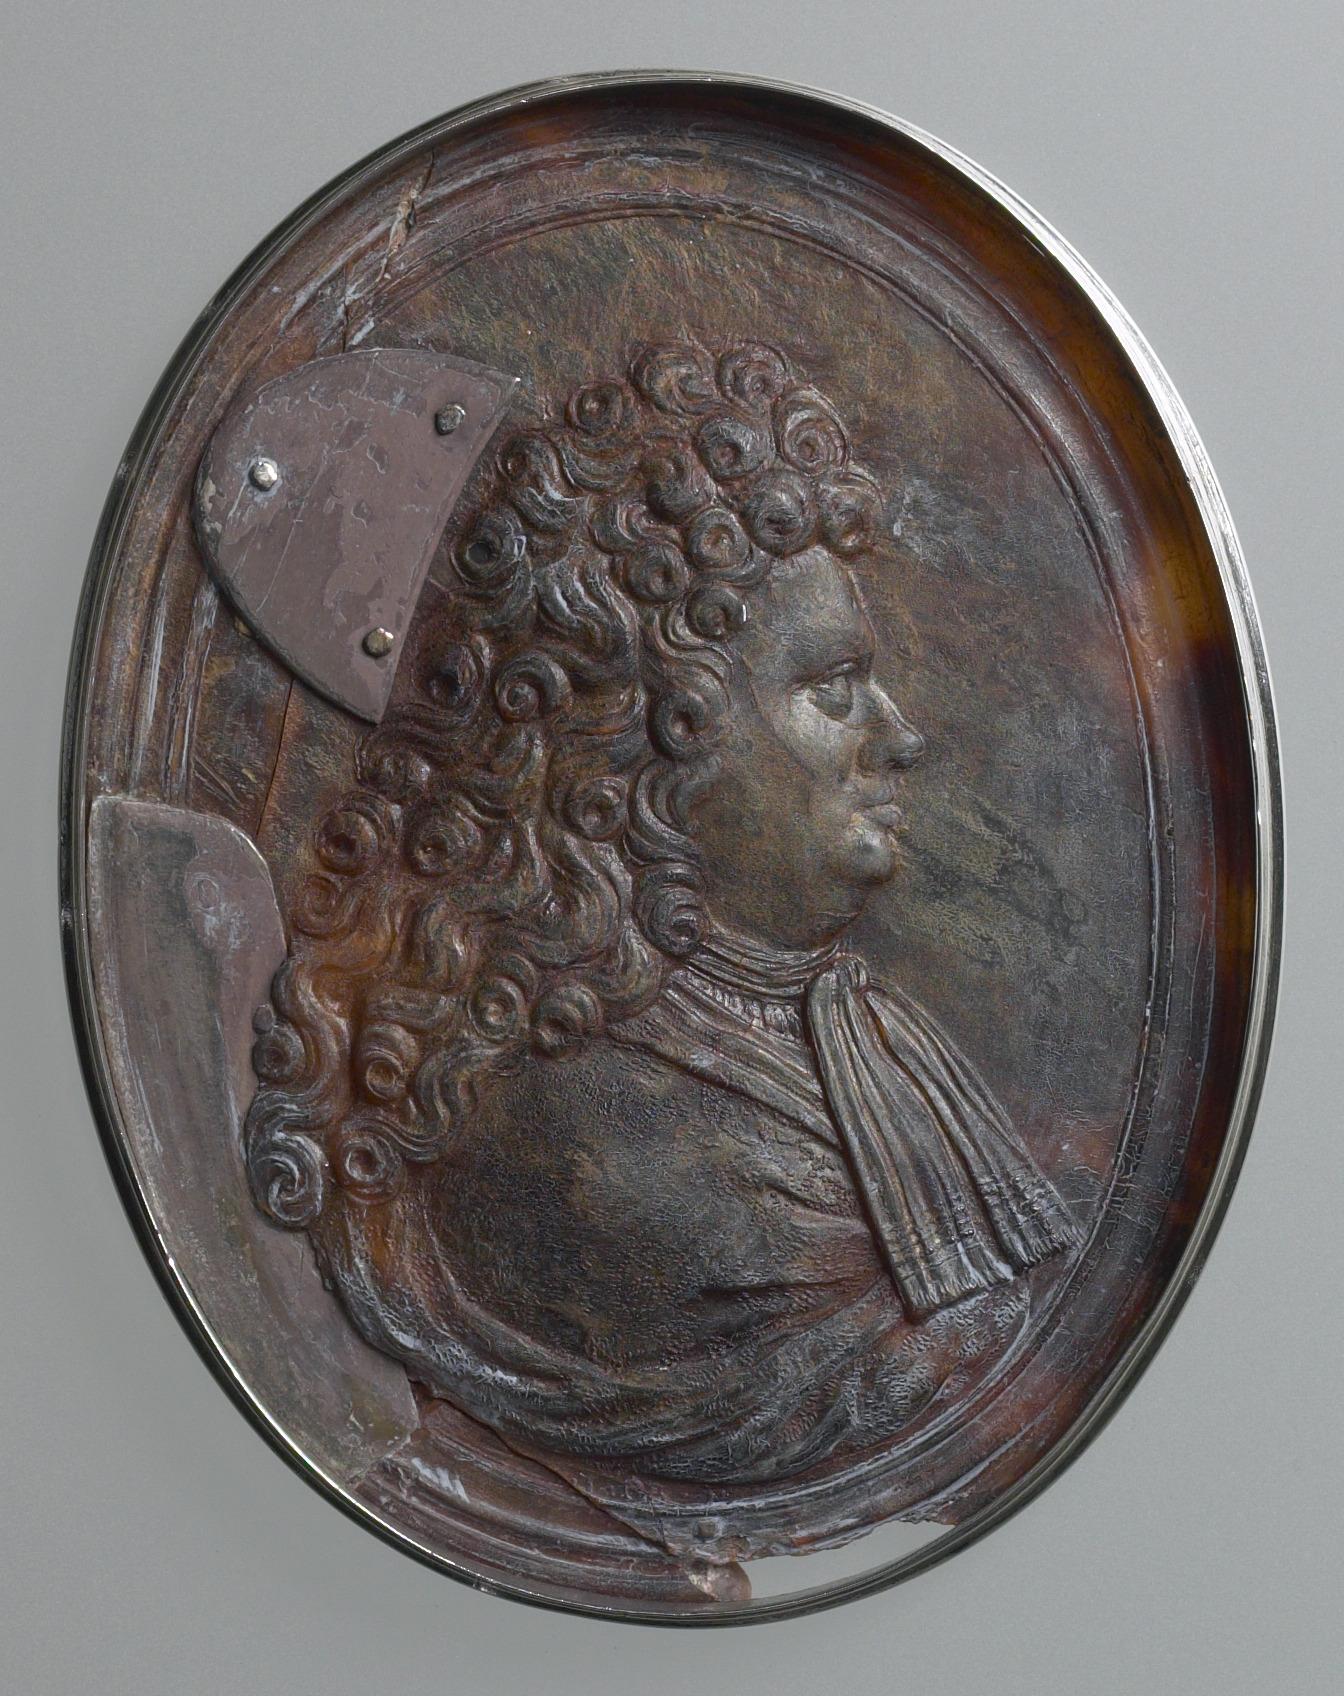 John Obrisset, Elihu Yale Snuffbox, ca. 1710–20, silver and tortoiseshell, Yale University Art Gallery, Gift of Ezra Stiles, YUAG 1788.1